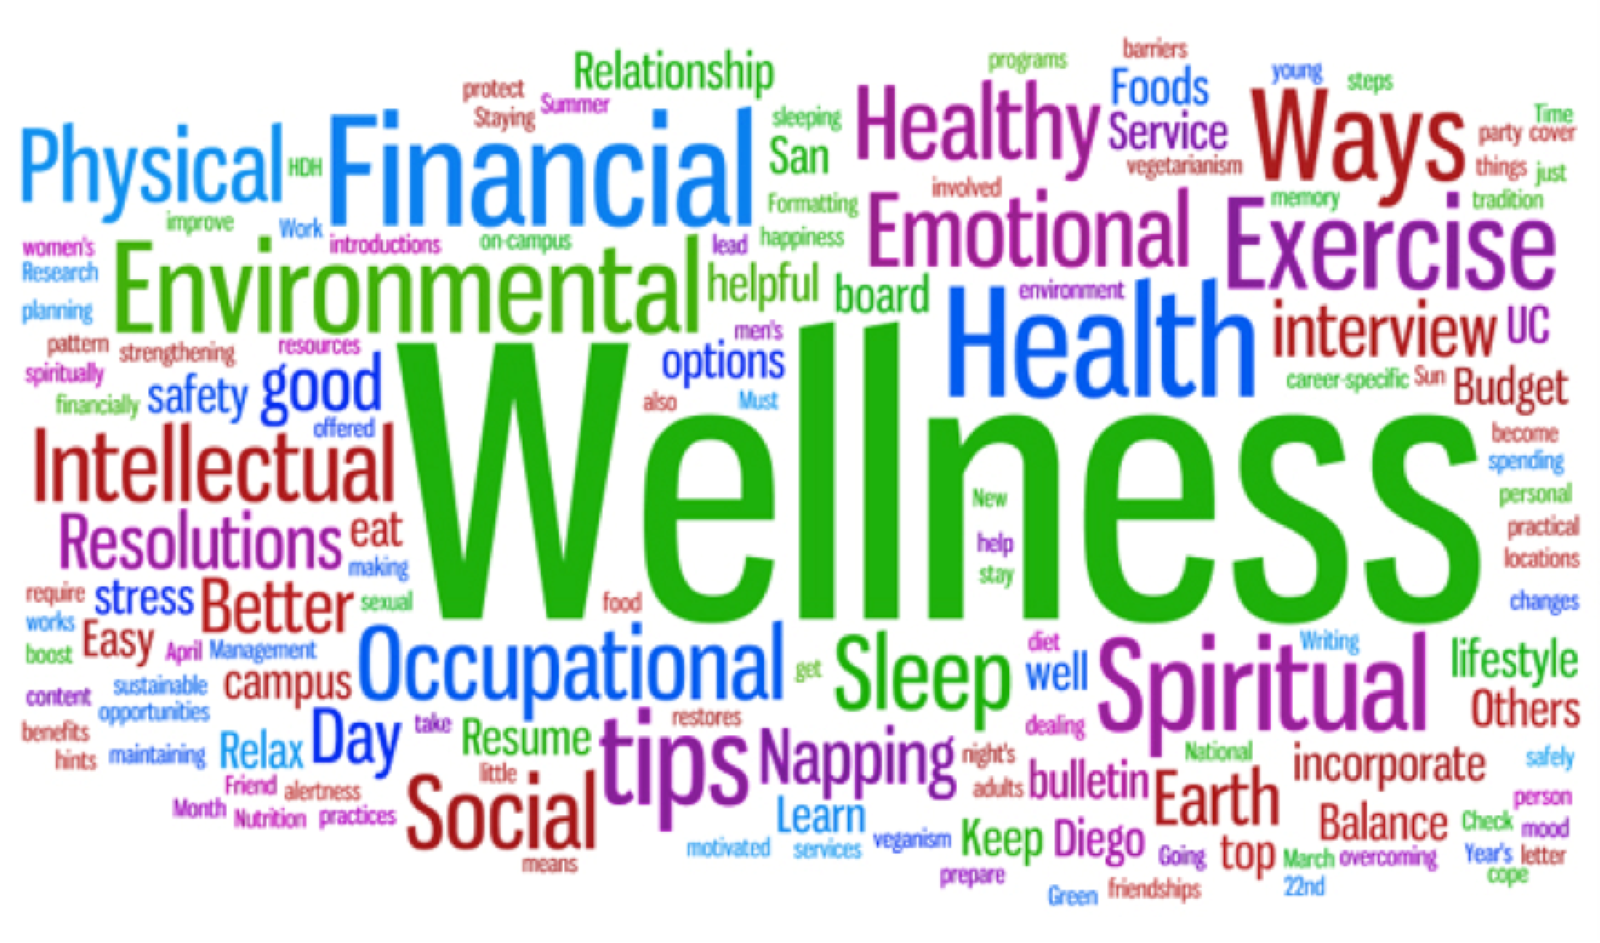 Health and Wellness Coaching ou le Coach Santé